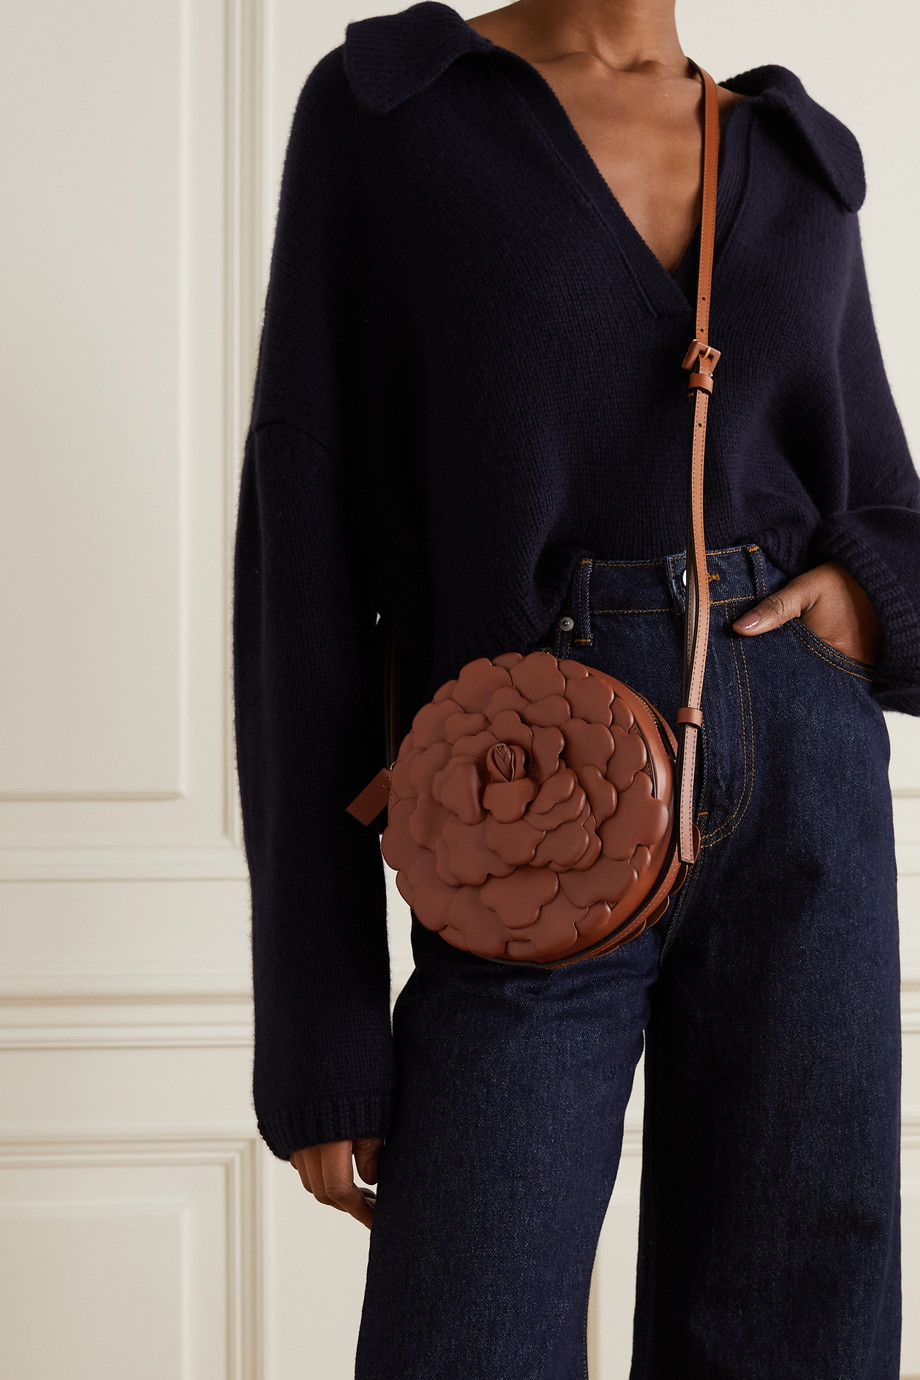 Valentino Valentino Garavani 03 Rose Edition Atelier leather shoulder bag